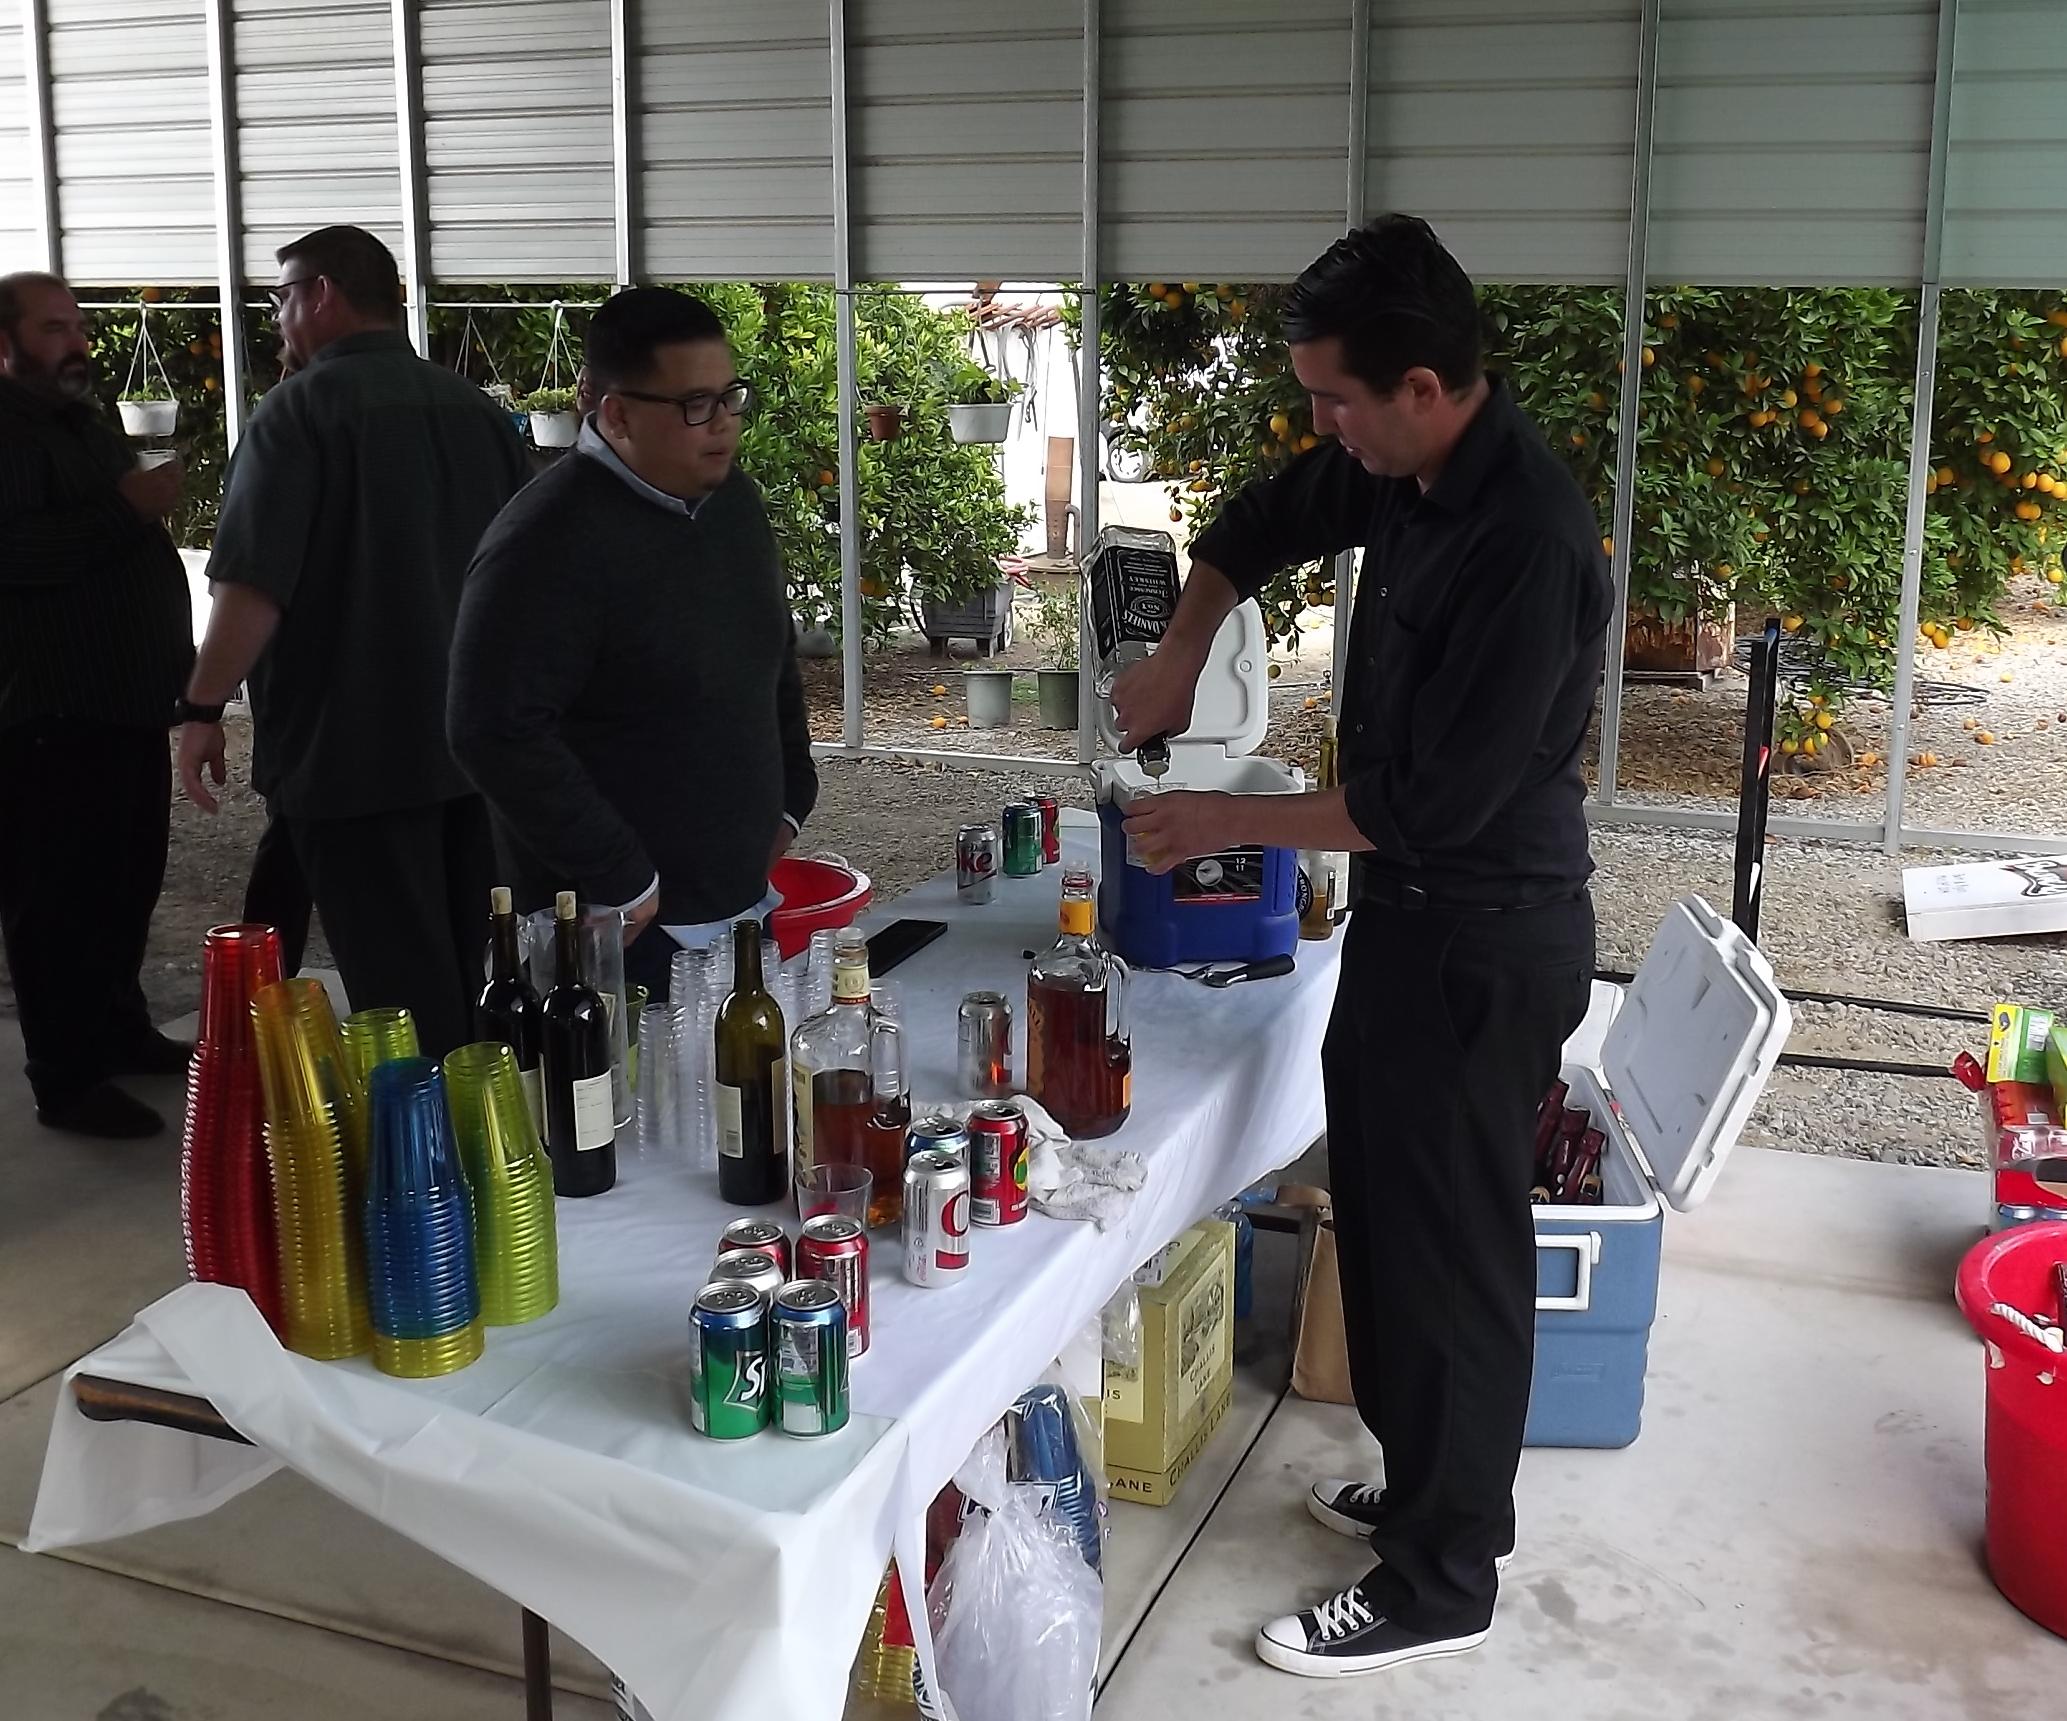 Bachelorette Party Bartender Shaken Not Stirred In La